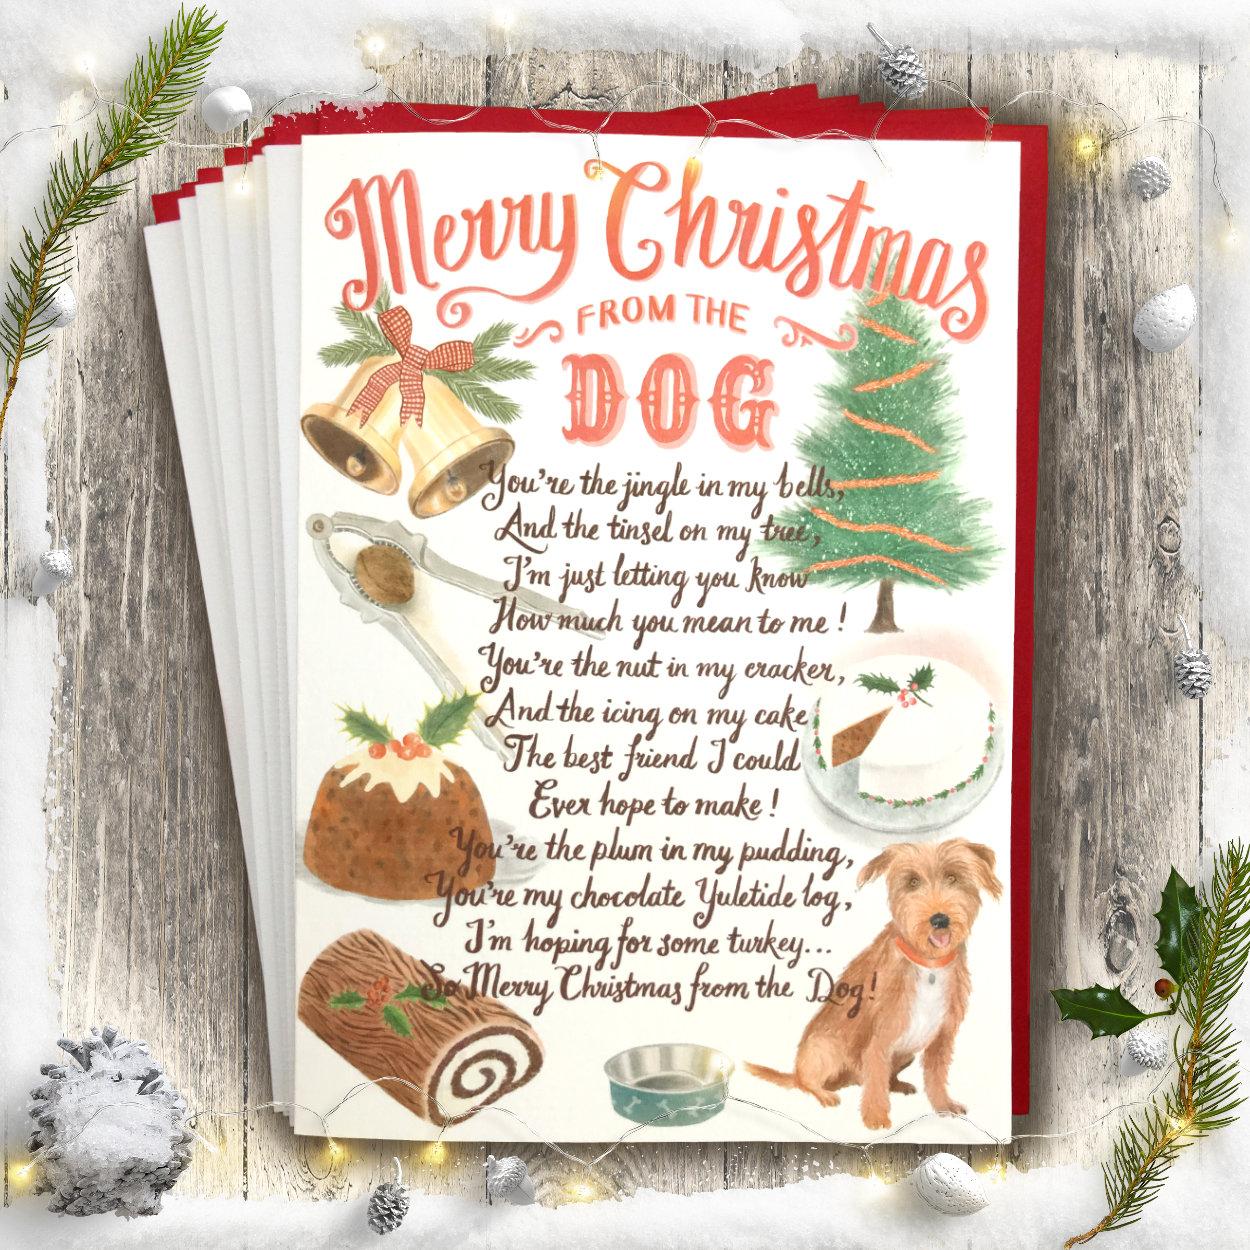 Dog Lover Christmas Card | The Enlightened Hound